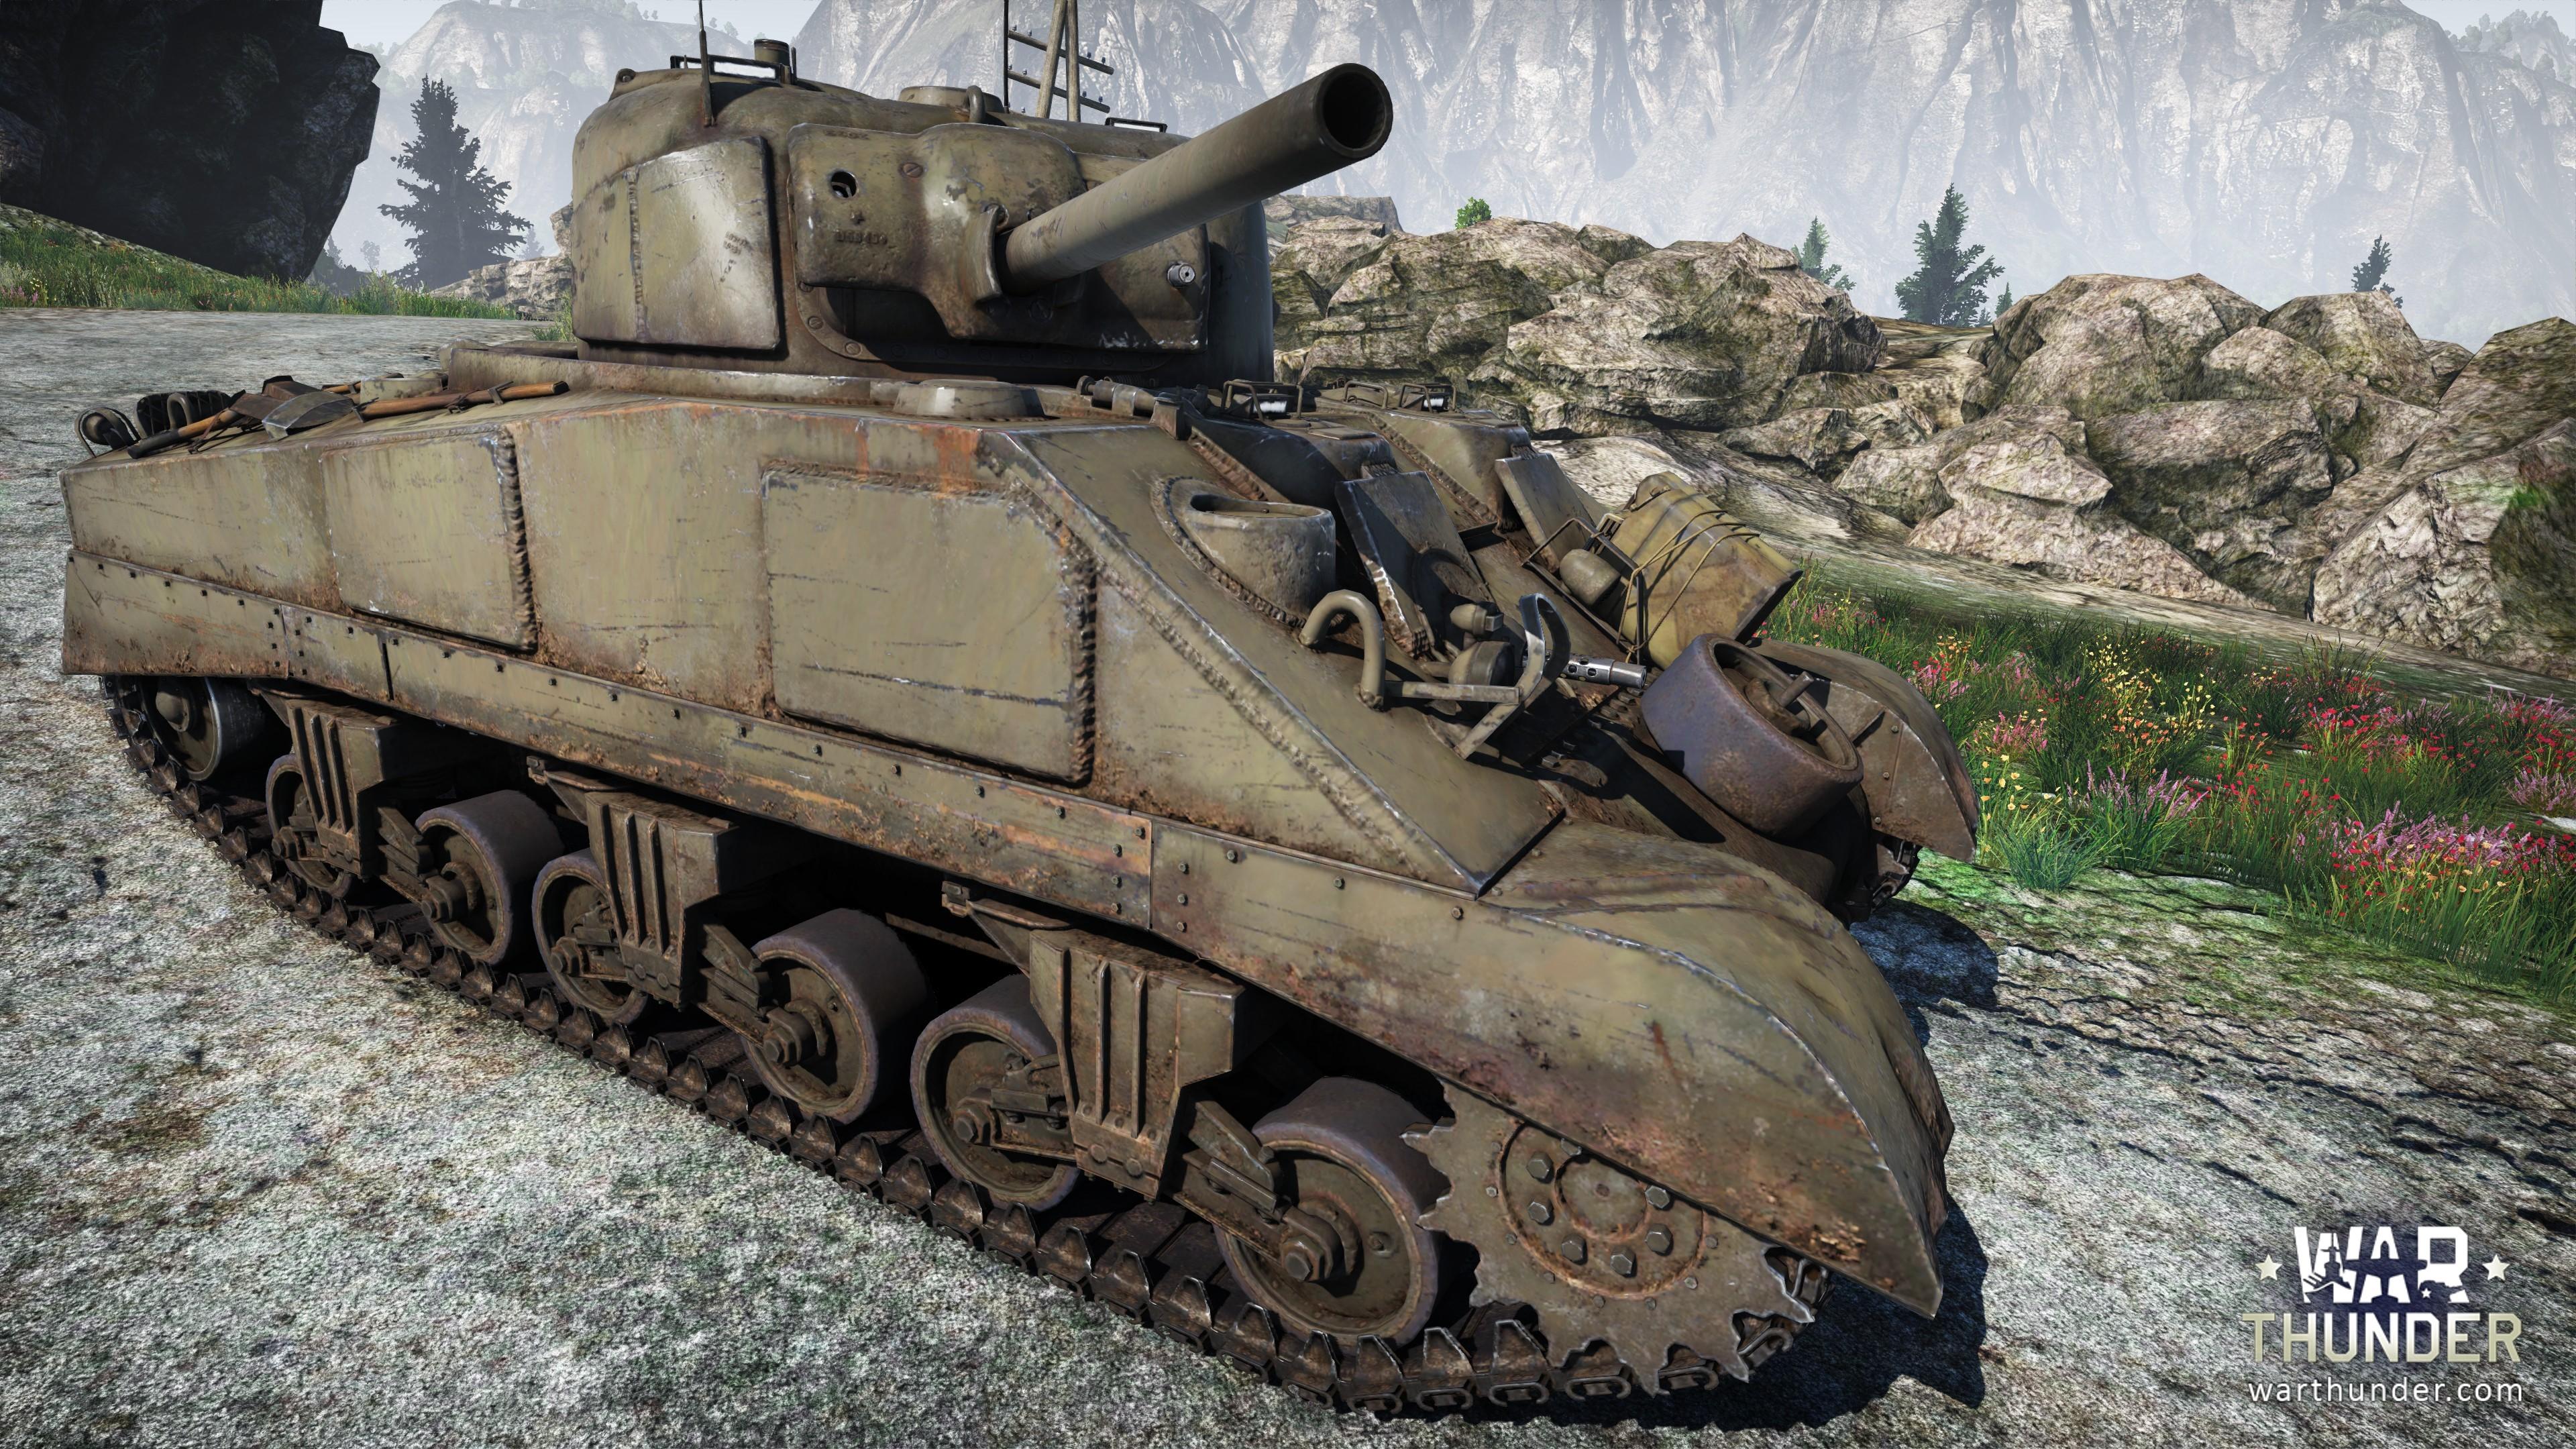 [Development]Steel Generals: M4 Sherman - War Thunder